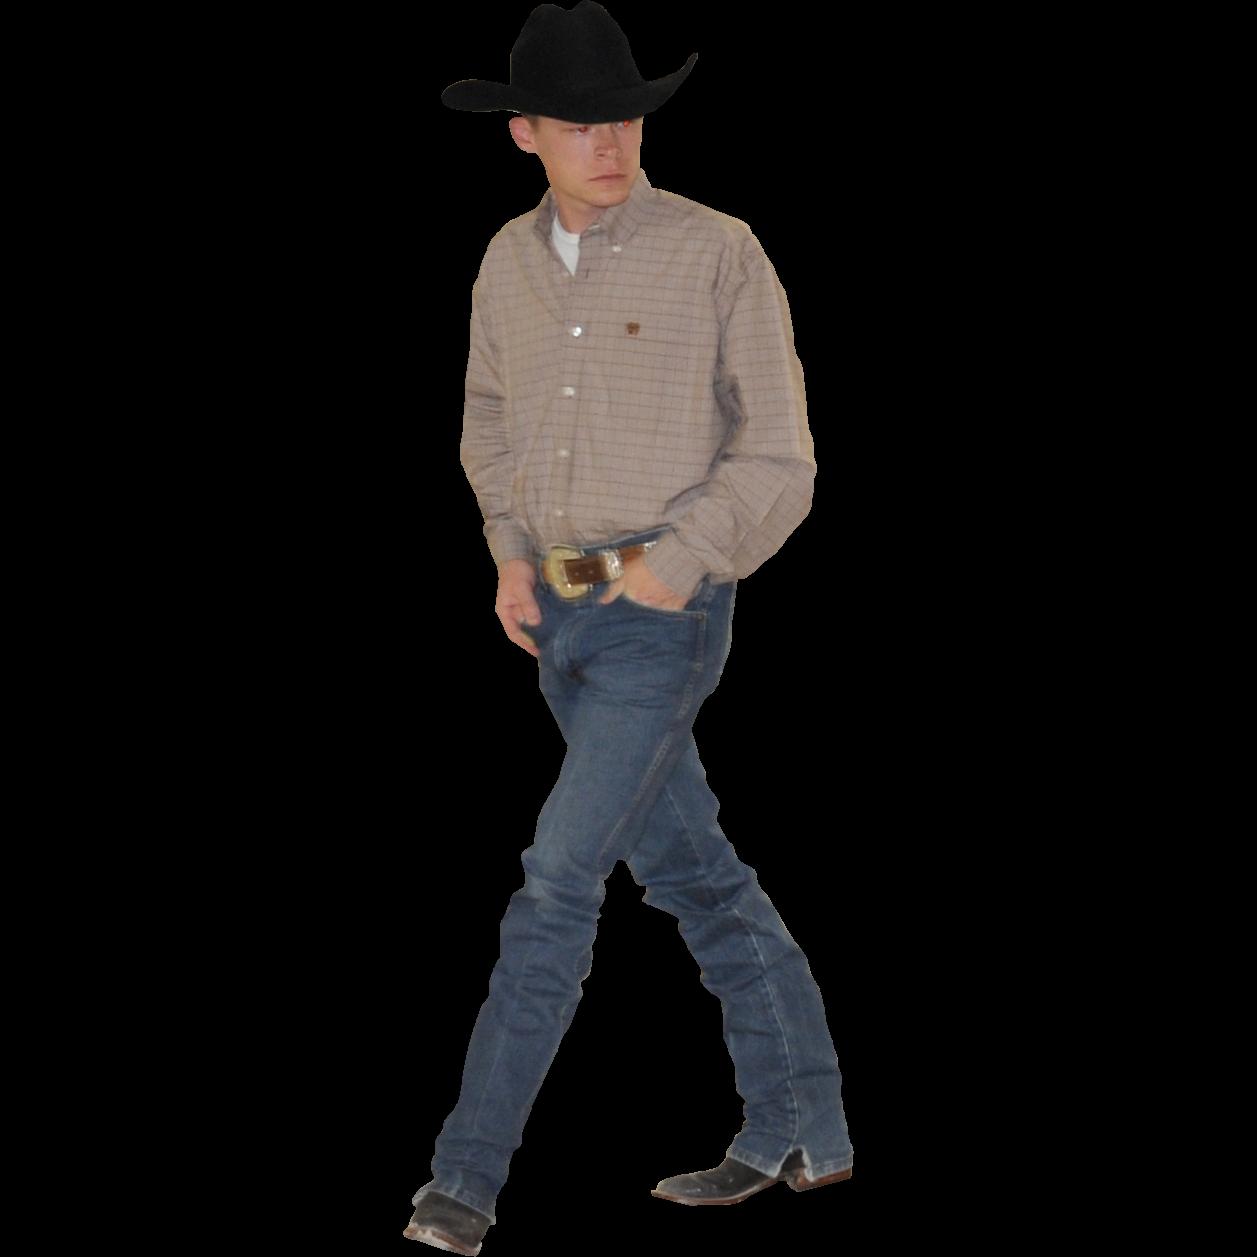 Clipart man cowboy. Png image purepng free